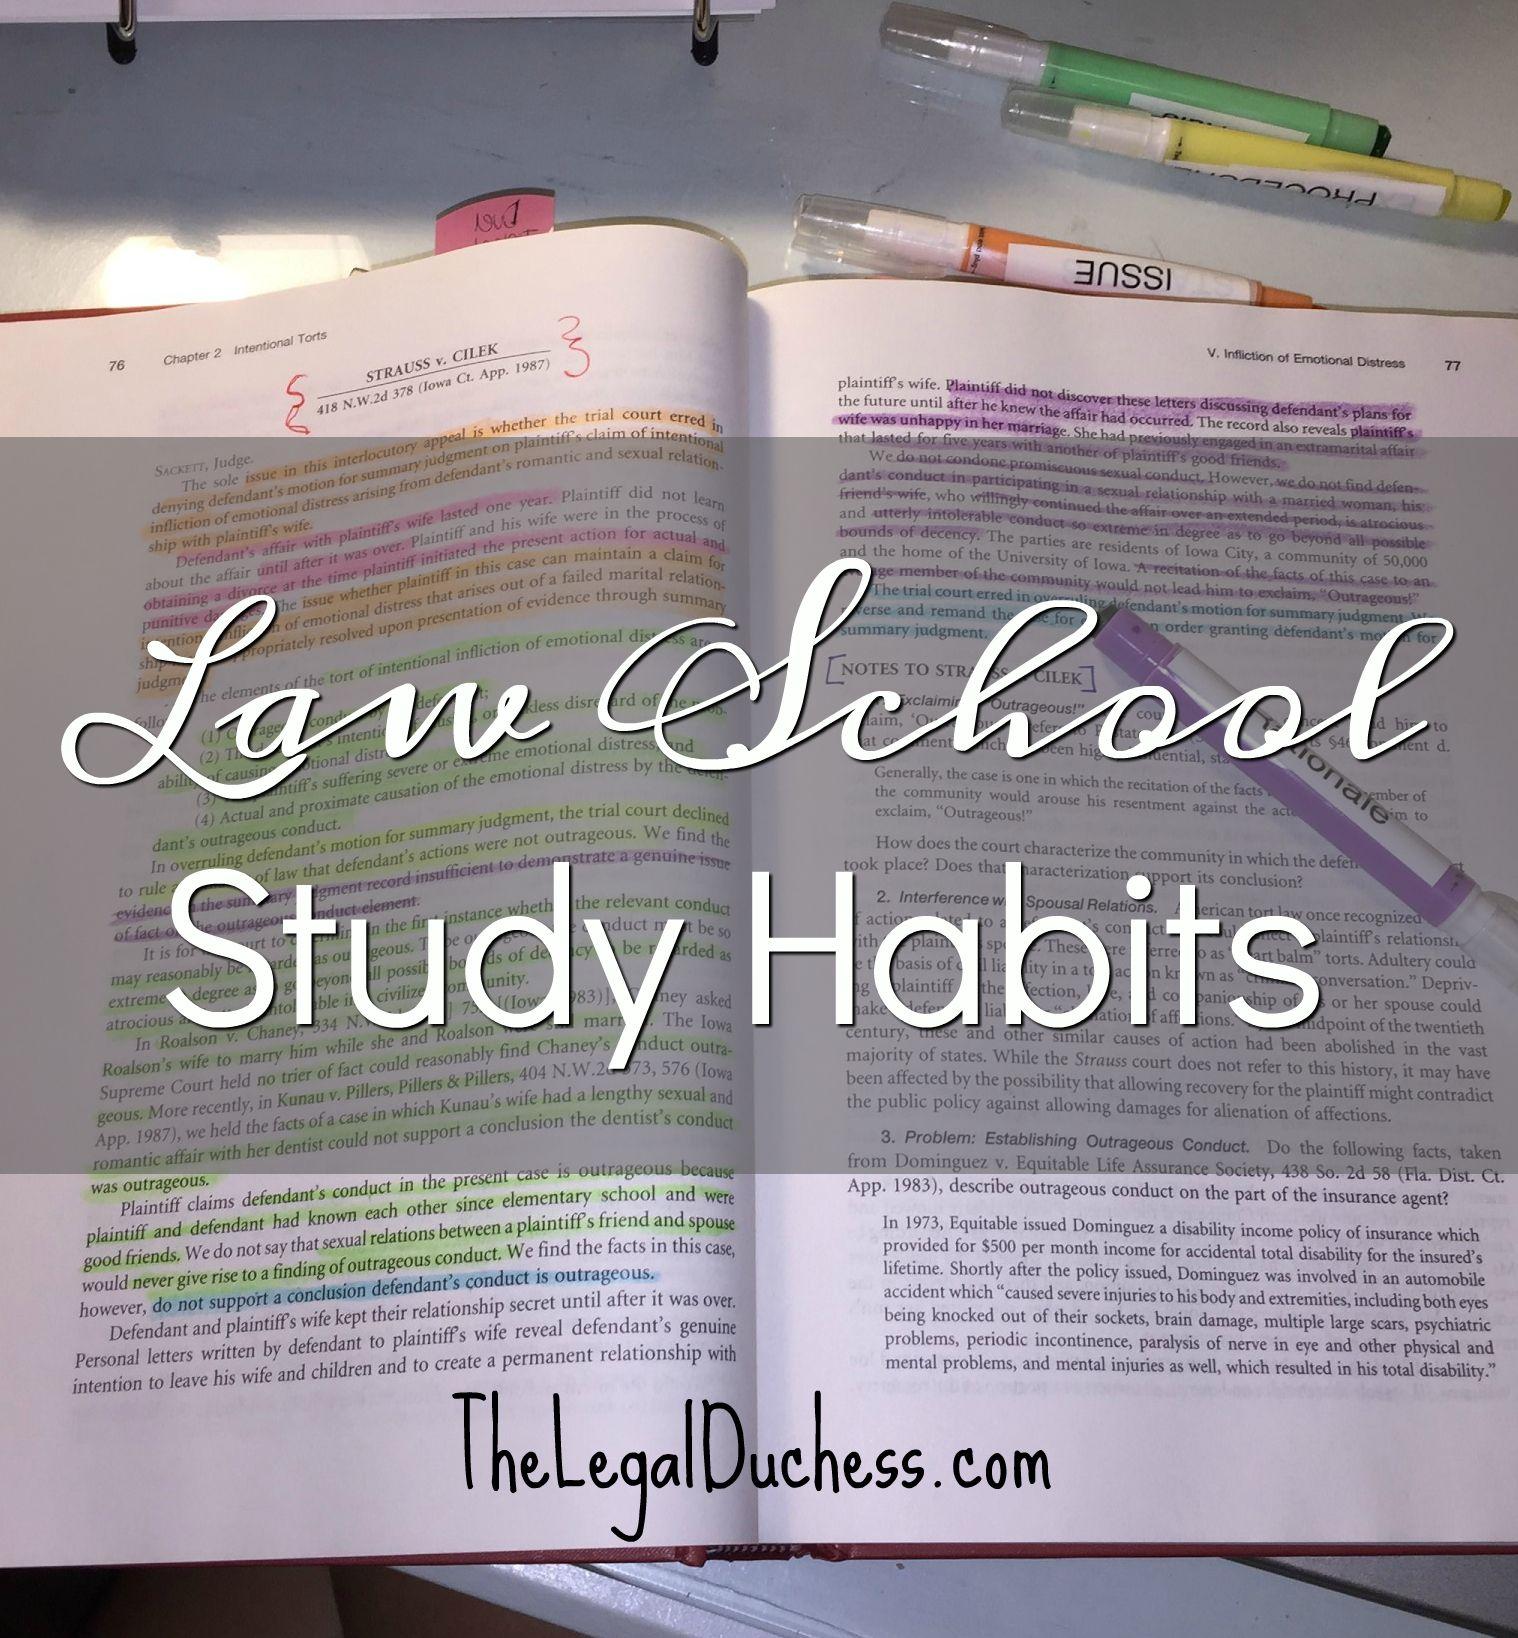 Best Environmental Law Programs - Top Law Schools - US ...